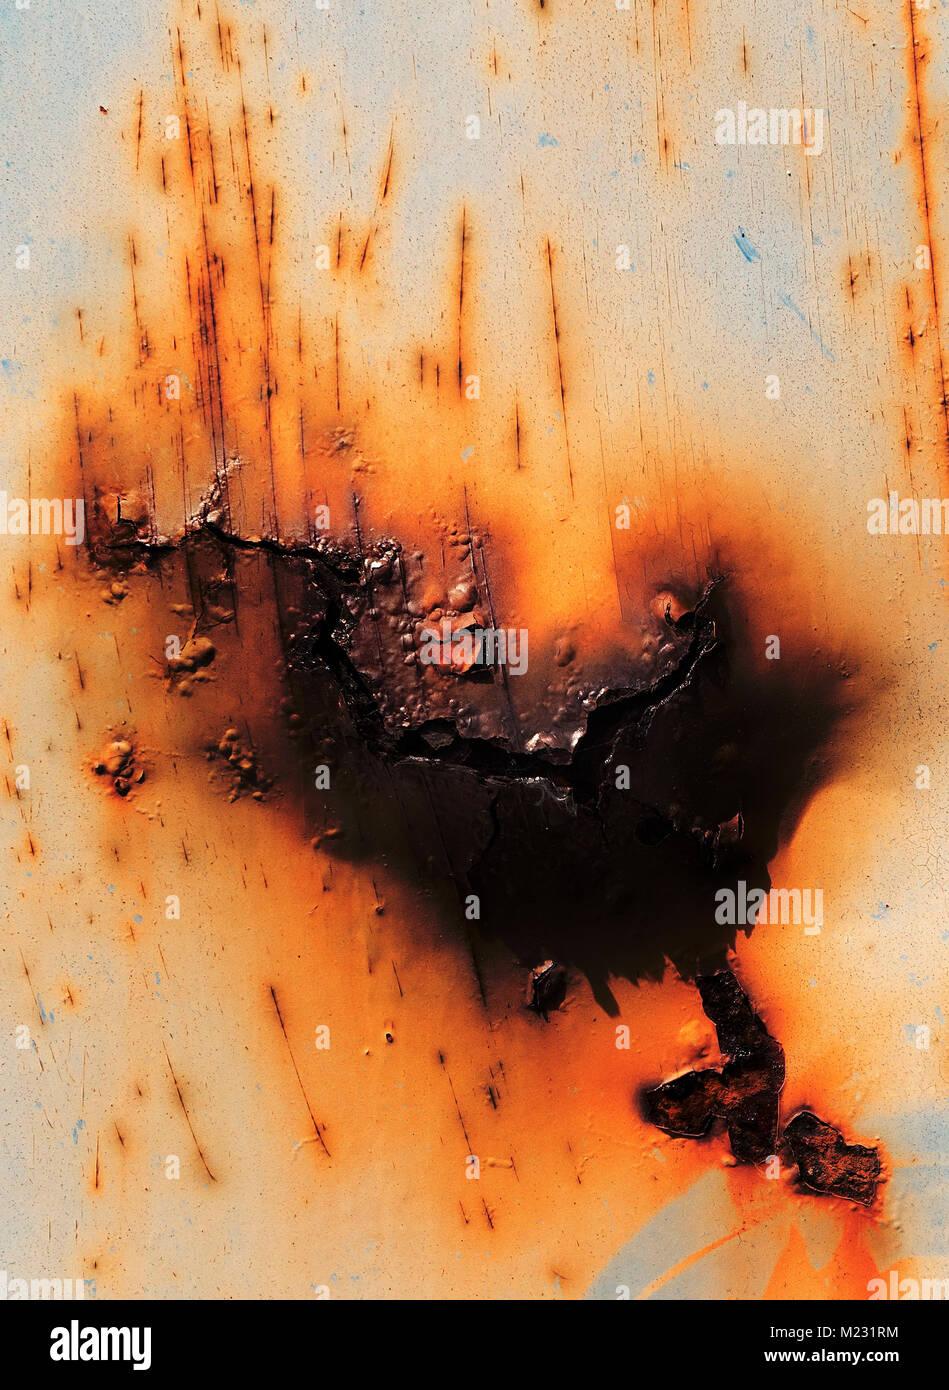 Rusty metal - Stock Image